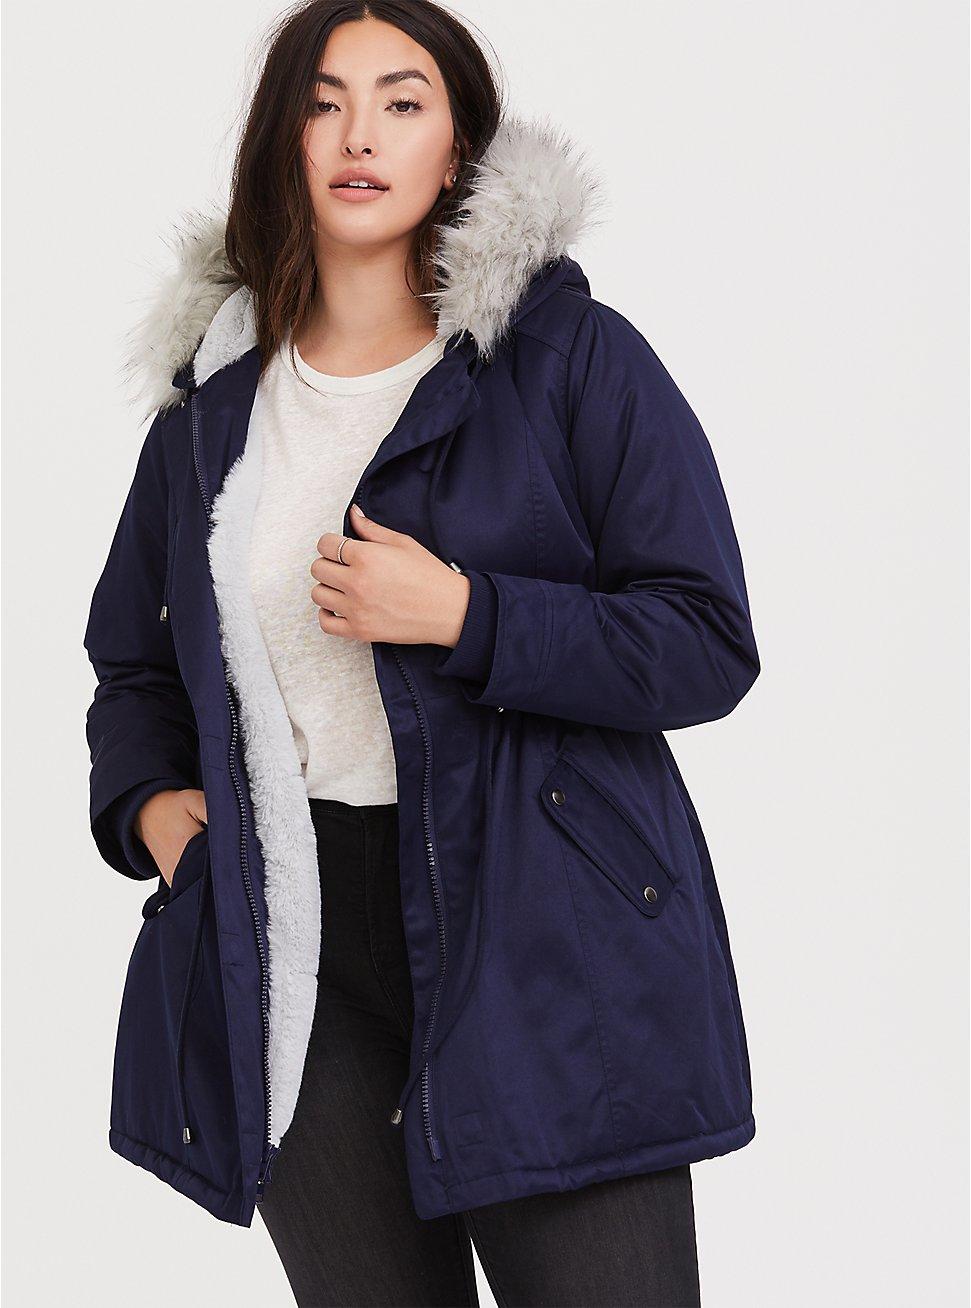 Navy Twill Faux Fur Trim Hooded Parka, , hi-res